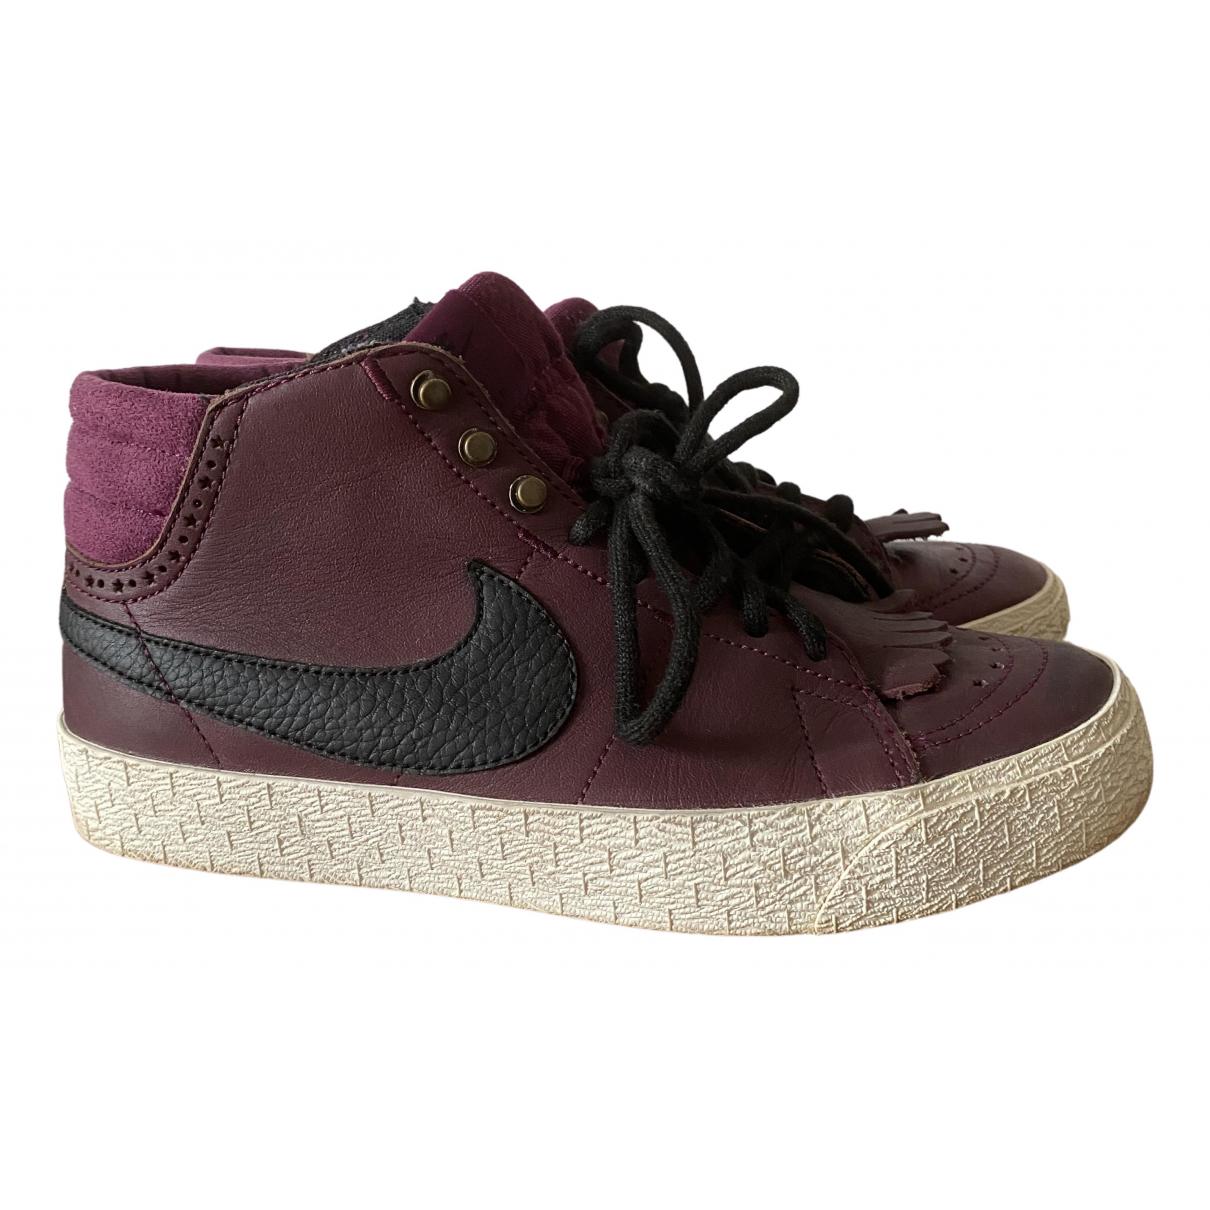 Nike - Baskets Blazer pour femme en cuir - violet